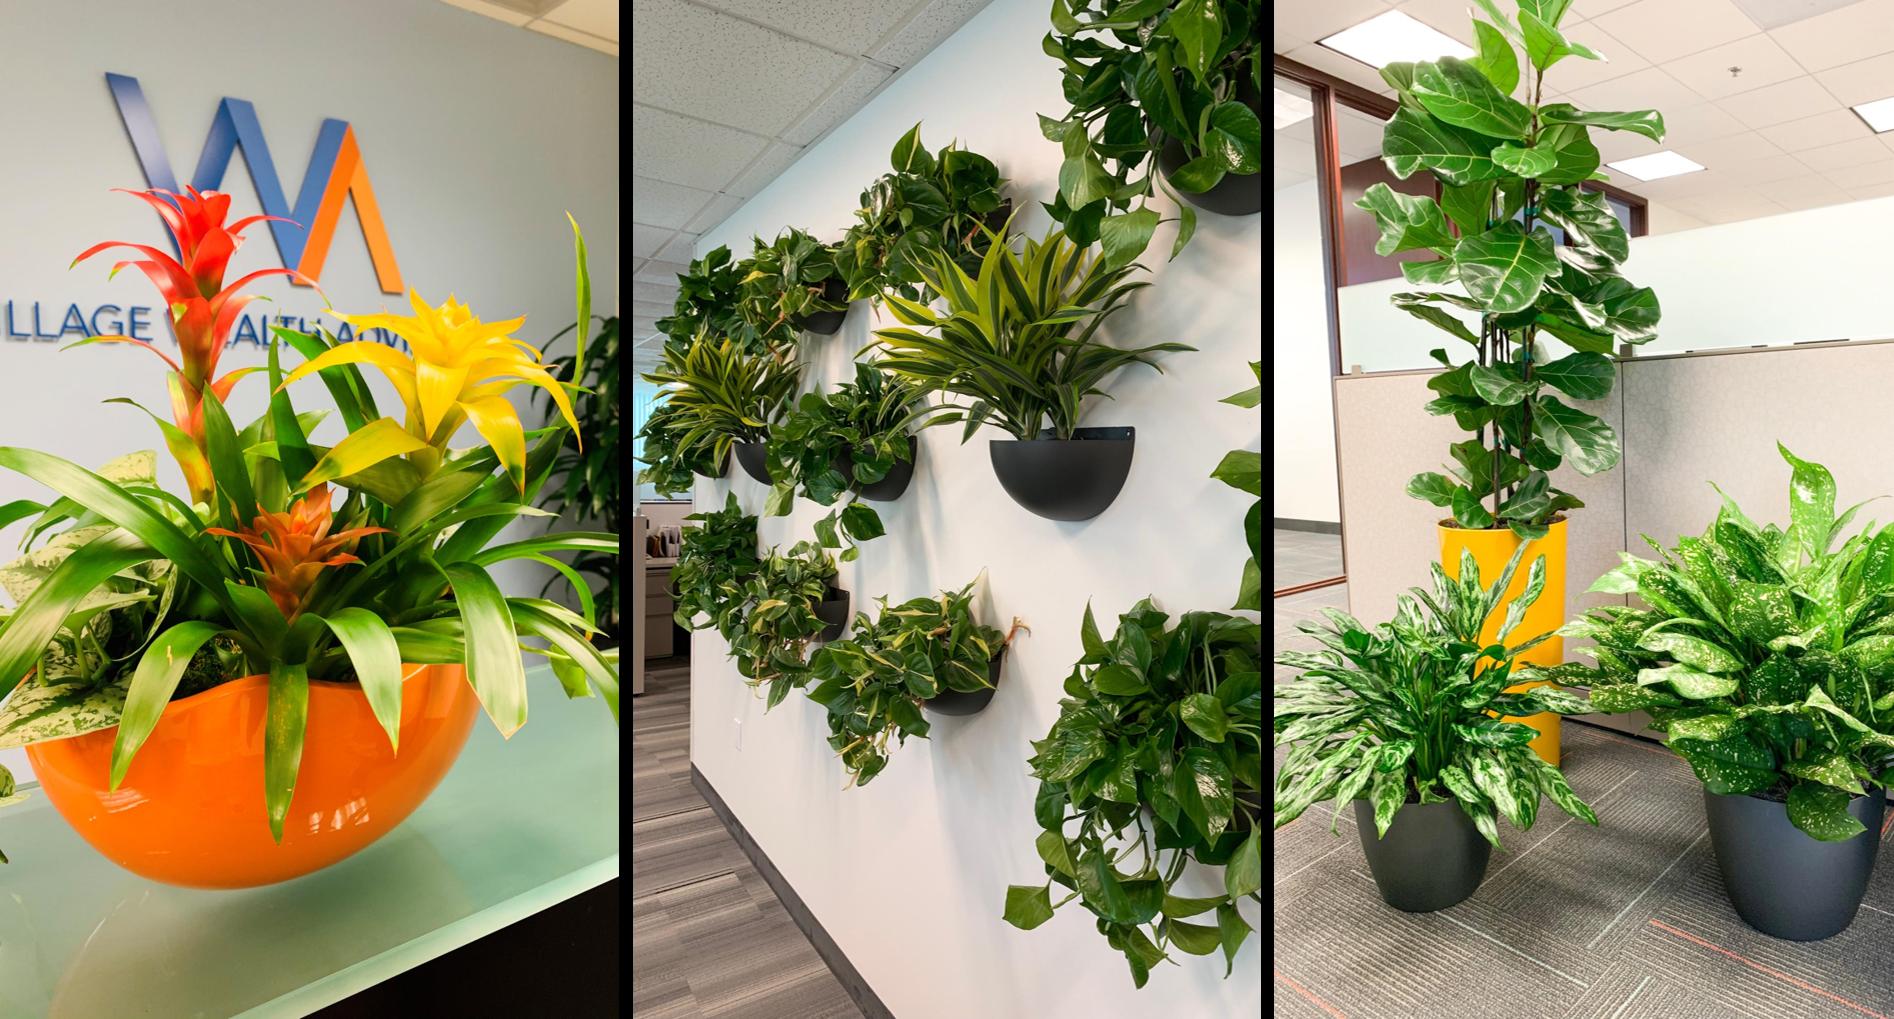 Lobby Plants, Wall Plants, Interior office plants, plant design, plant maintenance, plant rental, office plant rental, plant lease, plant service